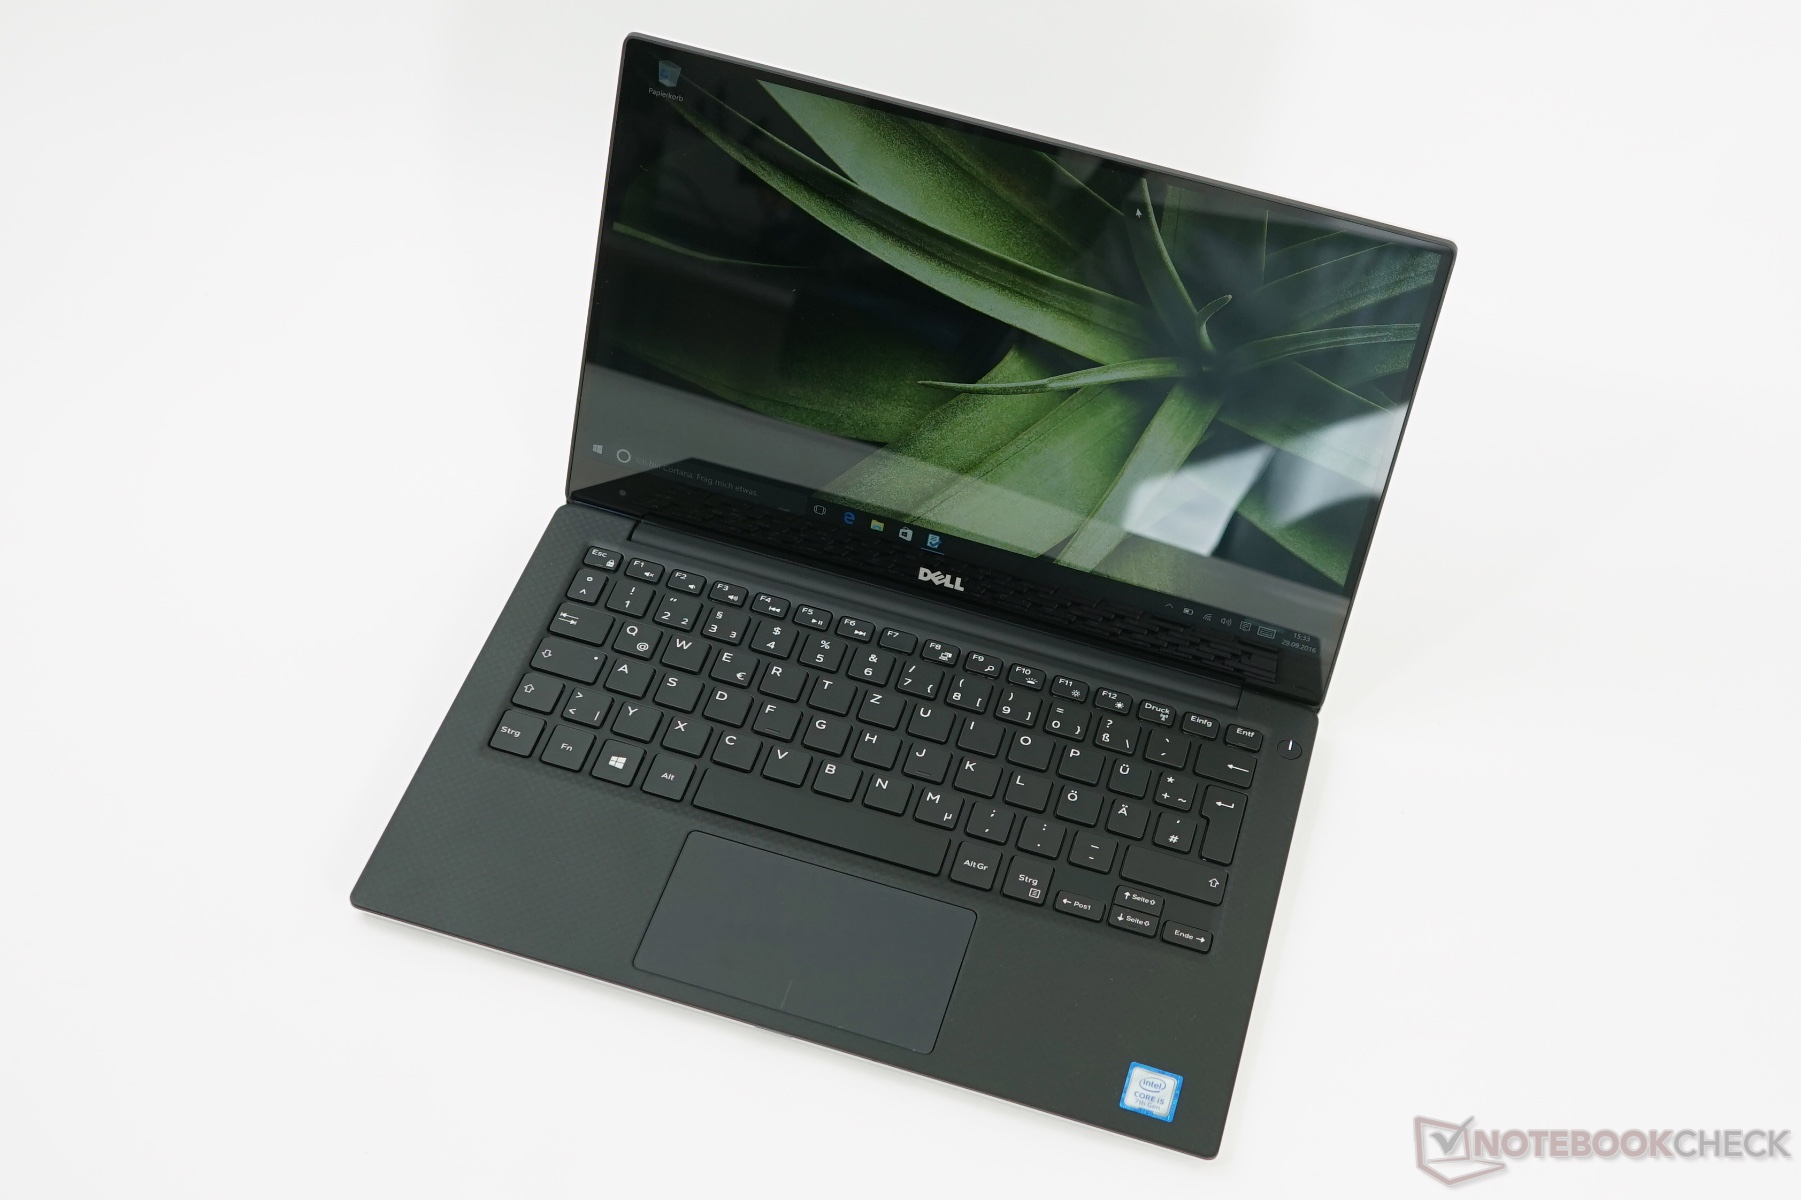 Xps 13 Notebookcheck